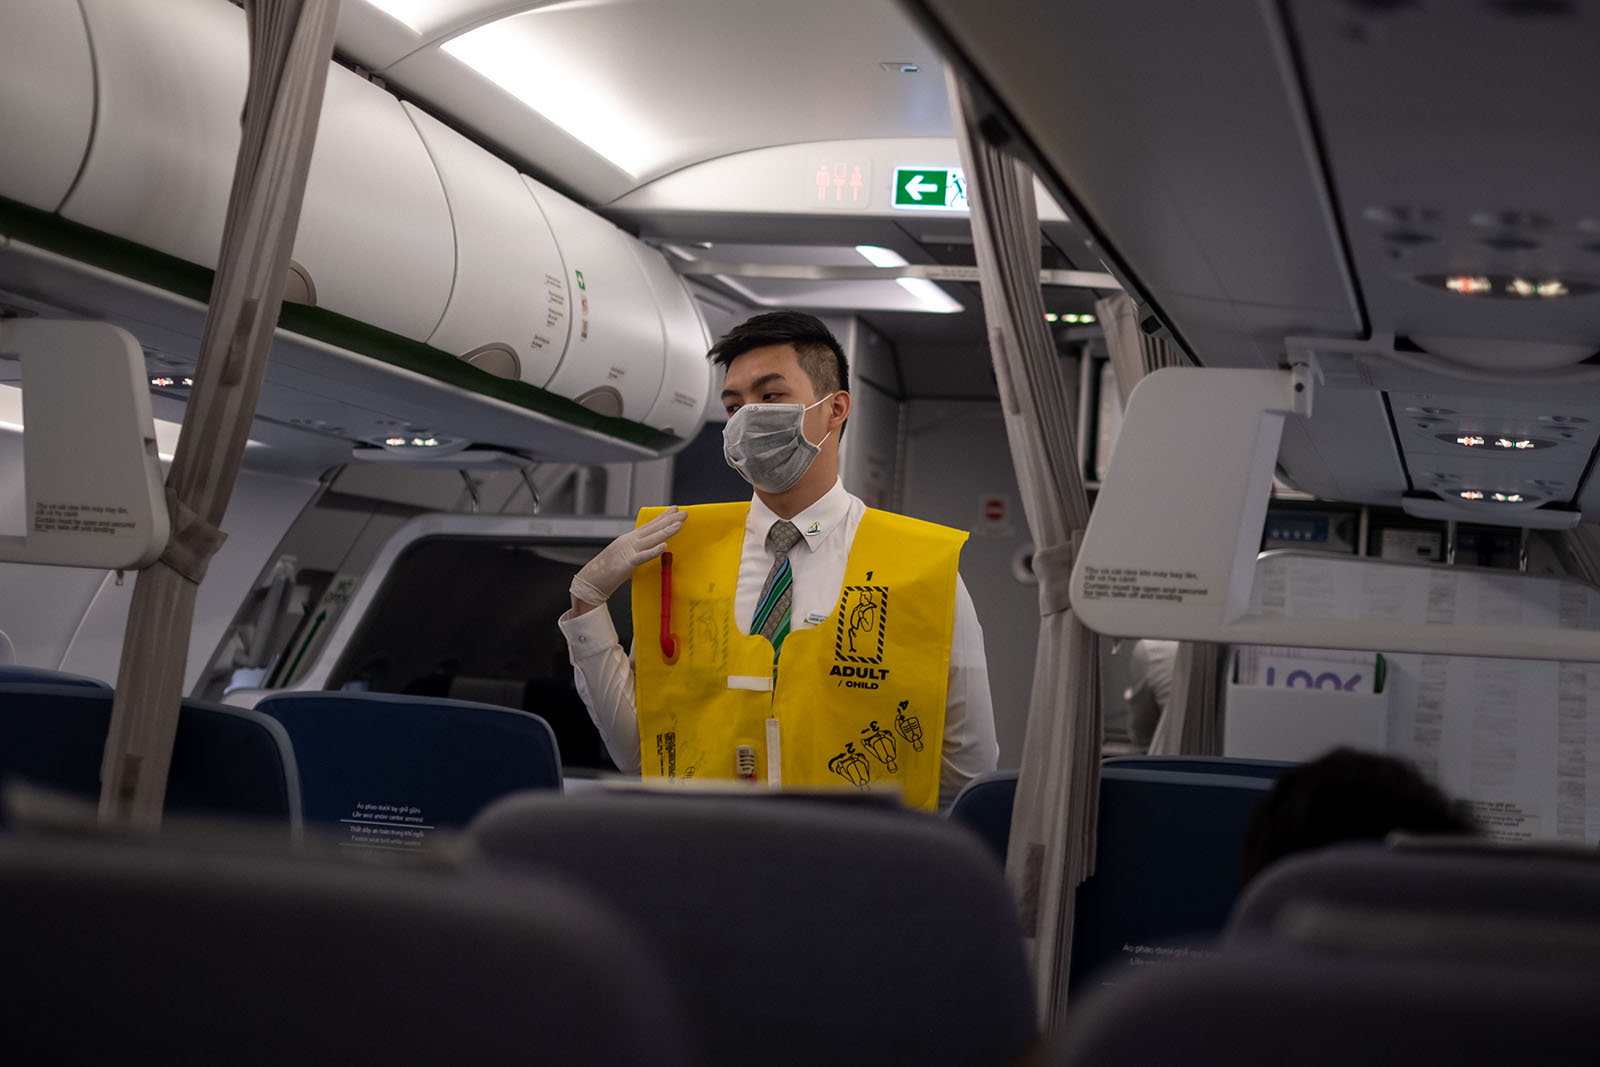 Corona Virus Airplane Prevention